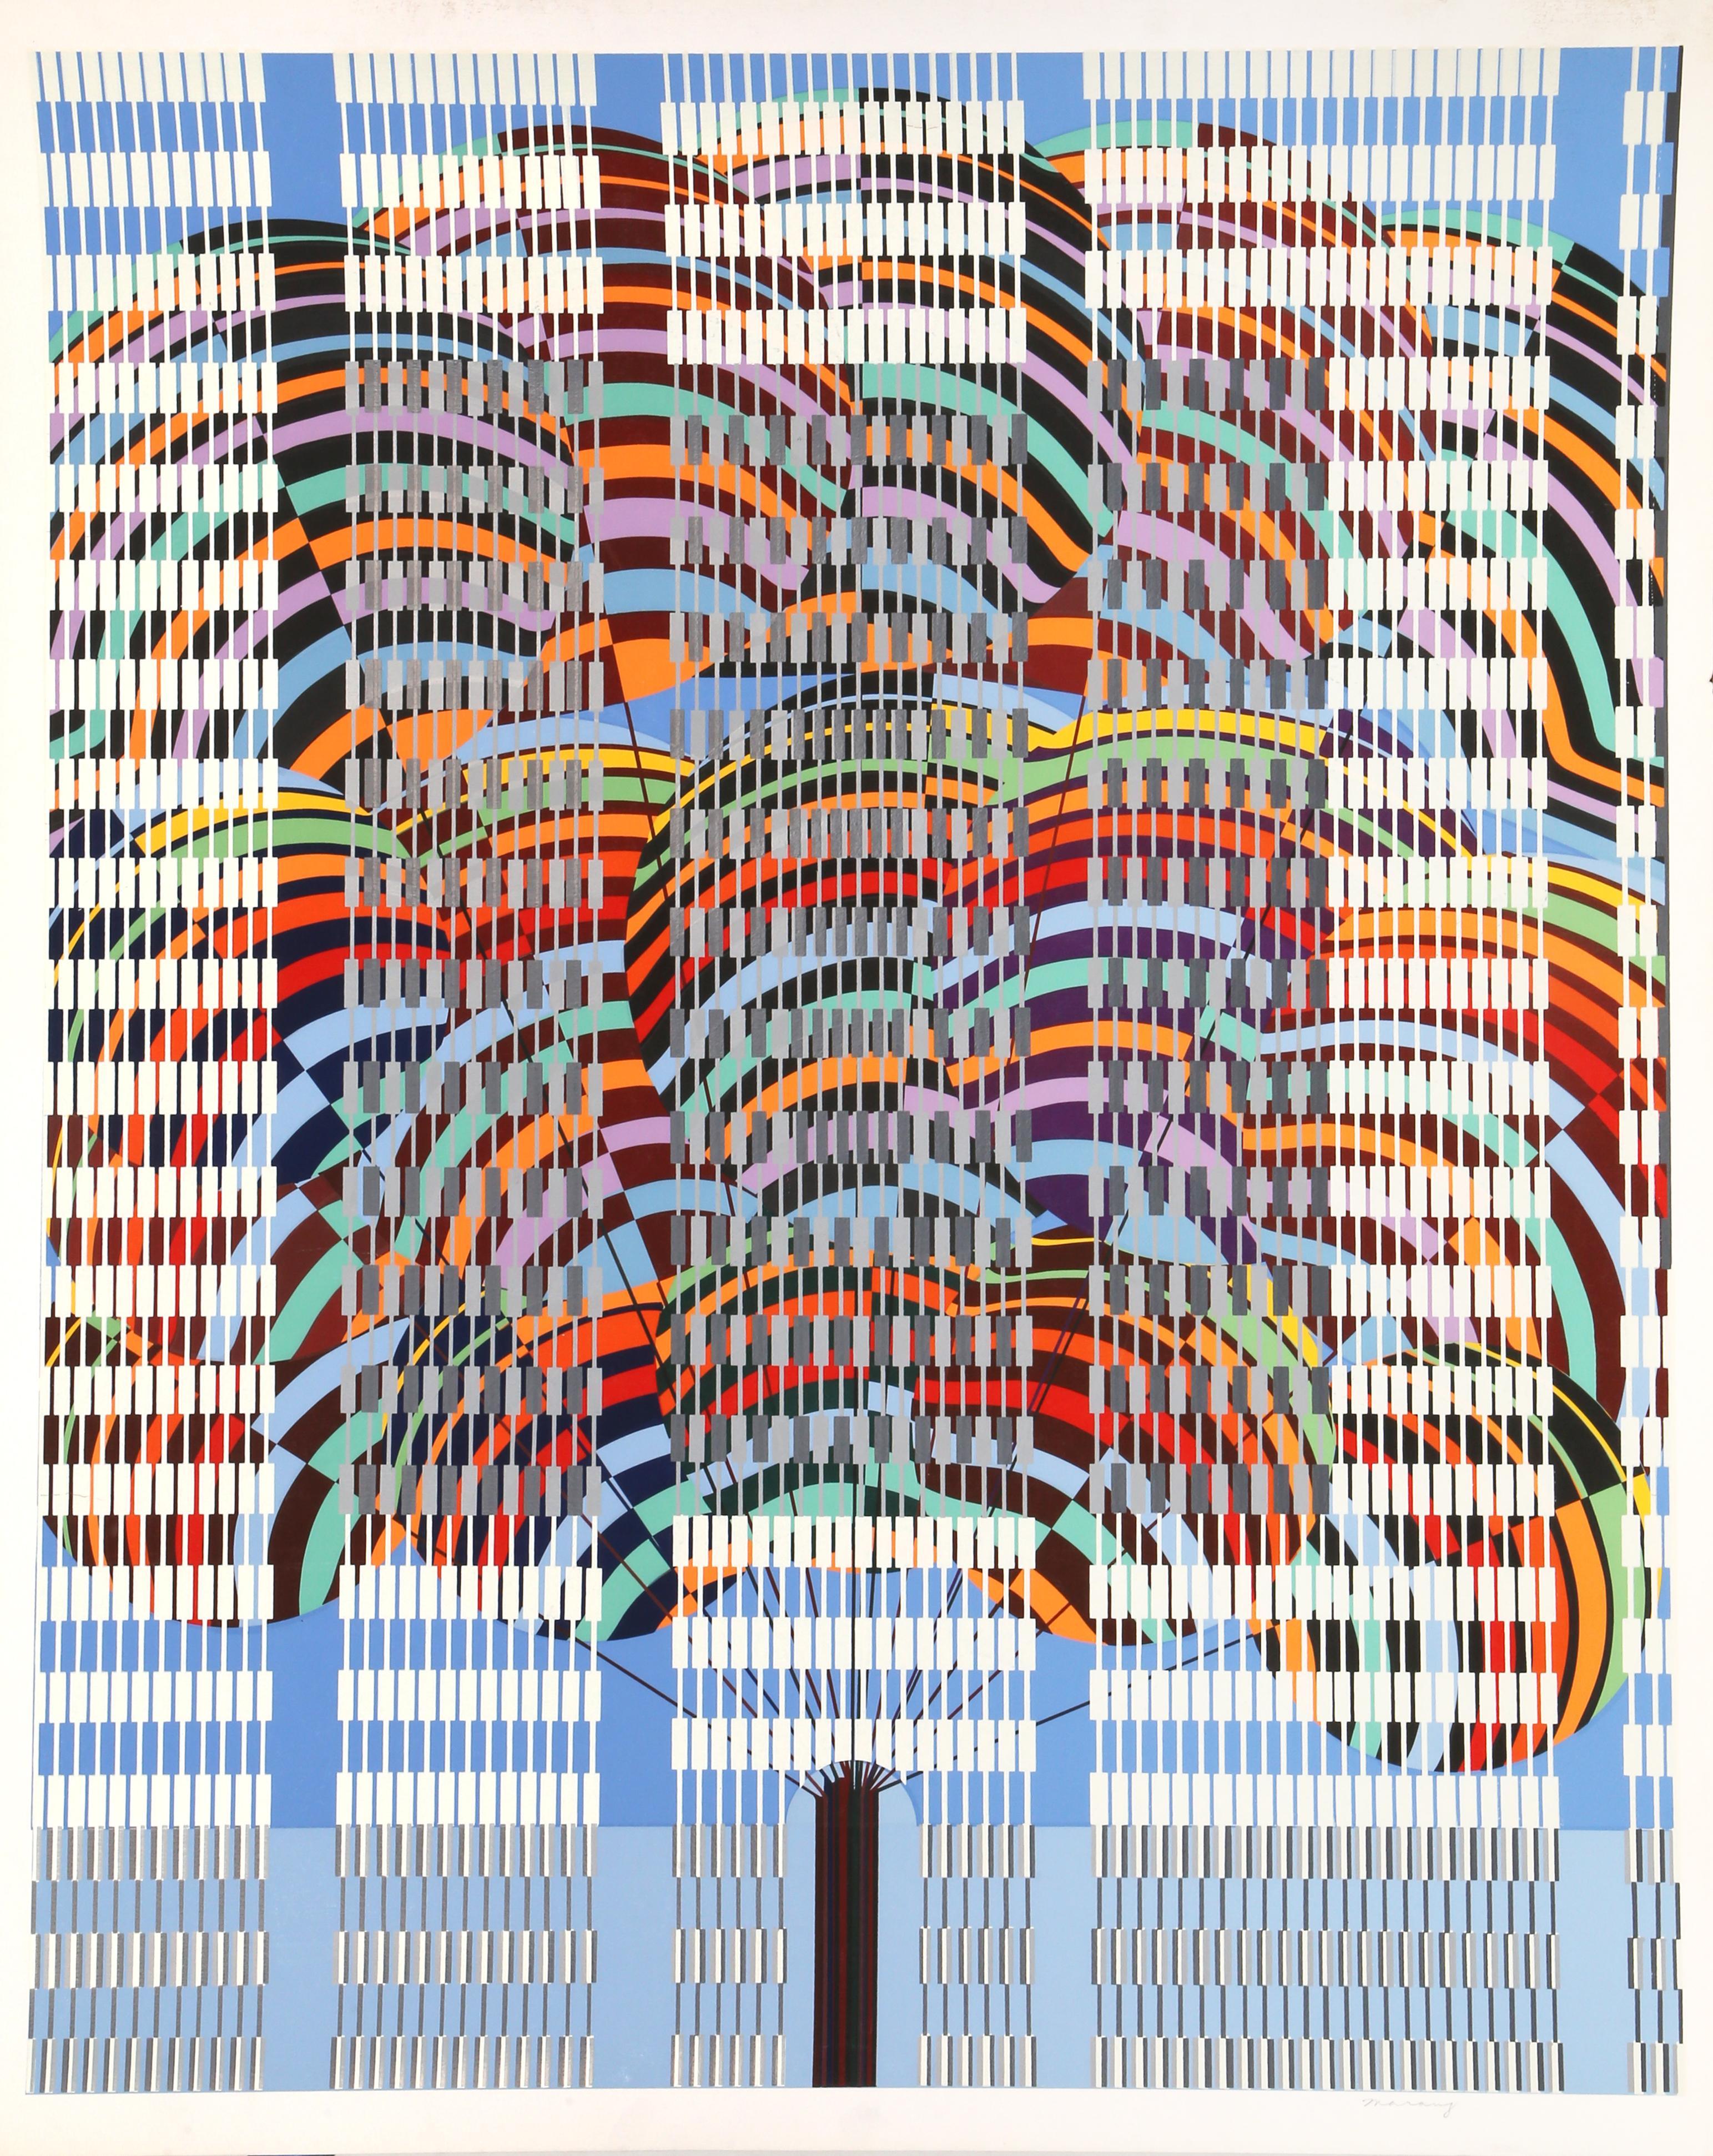 Balloons, Abstract Print by Leo Maranz